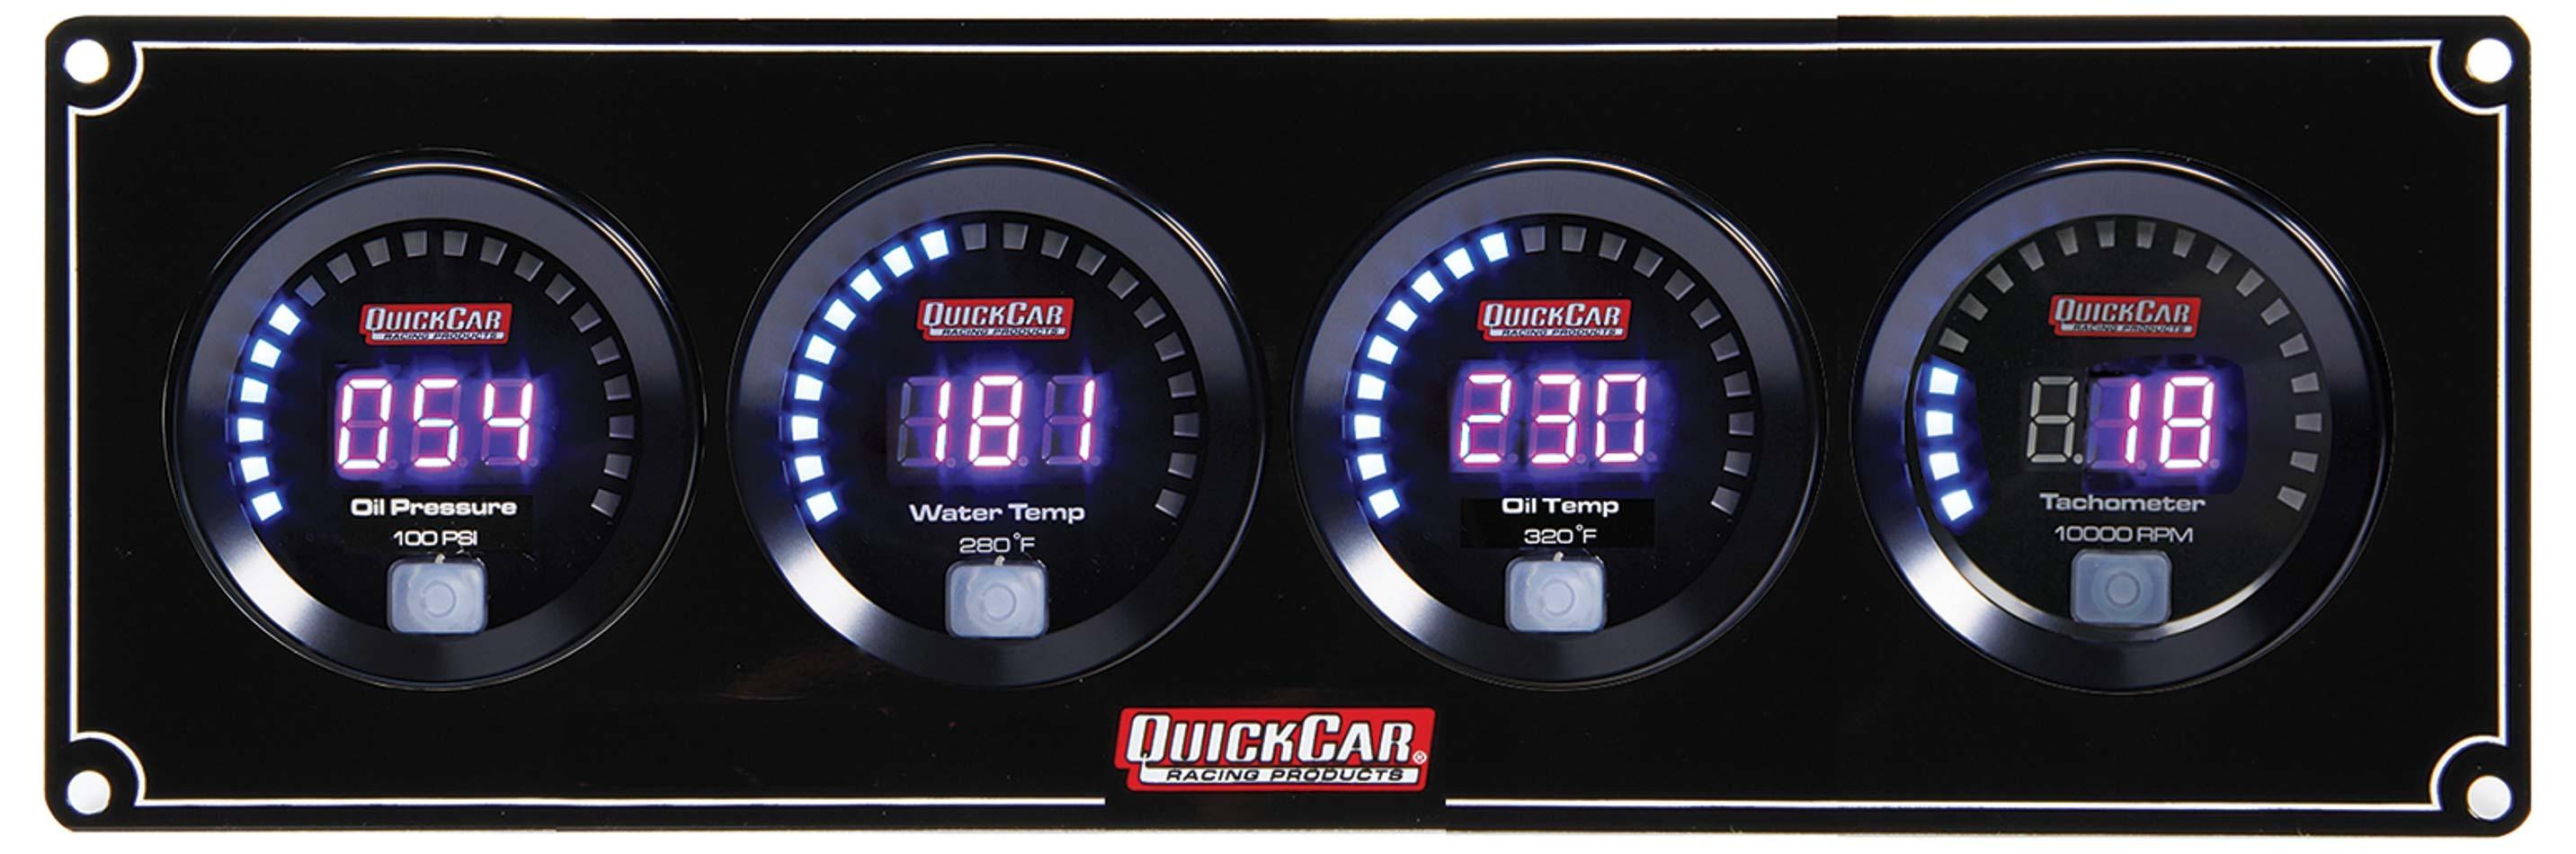 Quickcar Racing Products Digital 3-1 Gauge Panel OP/WT/OT w/Tach